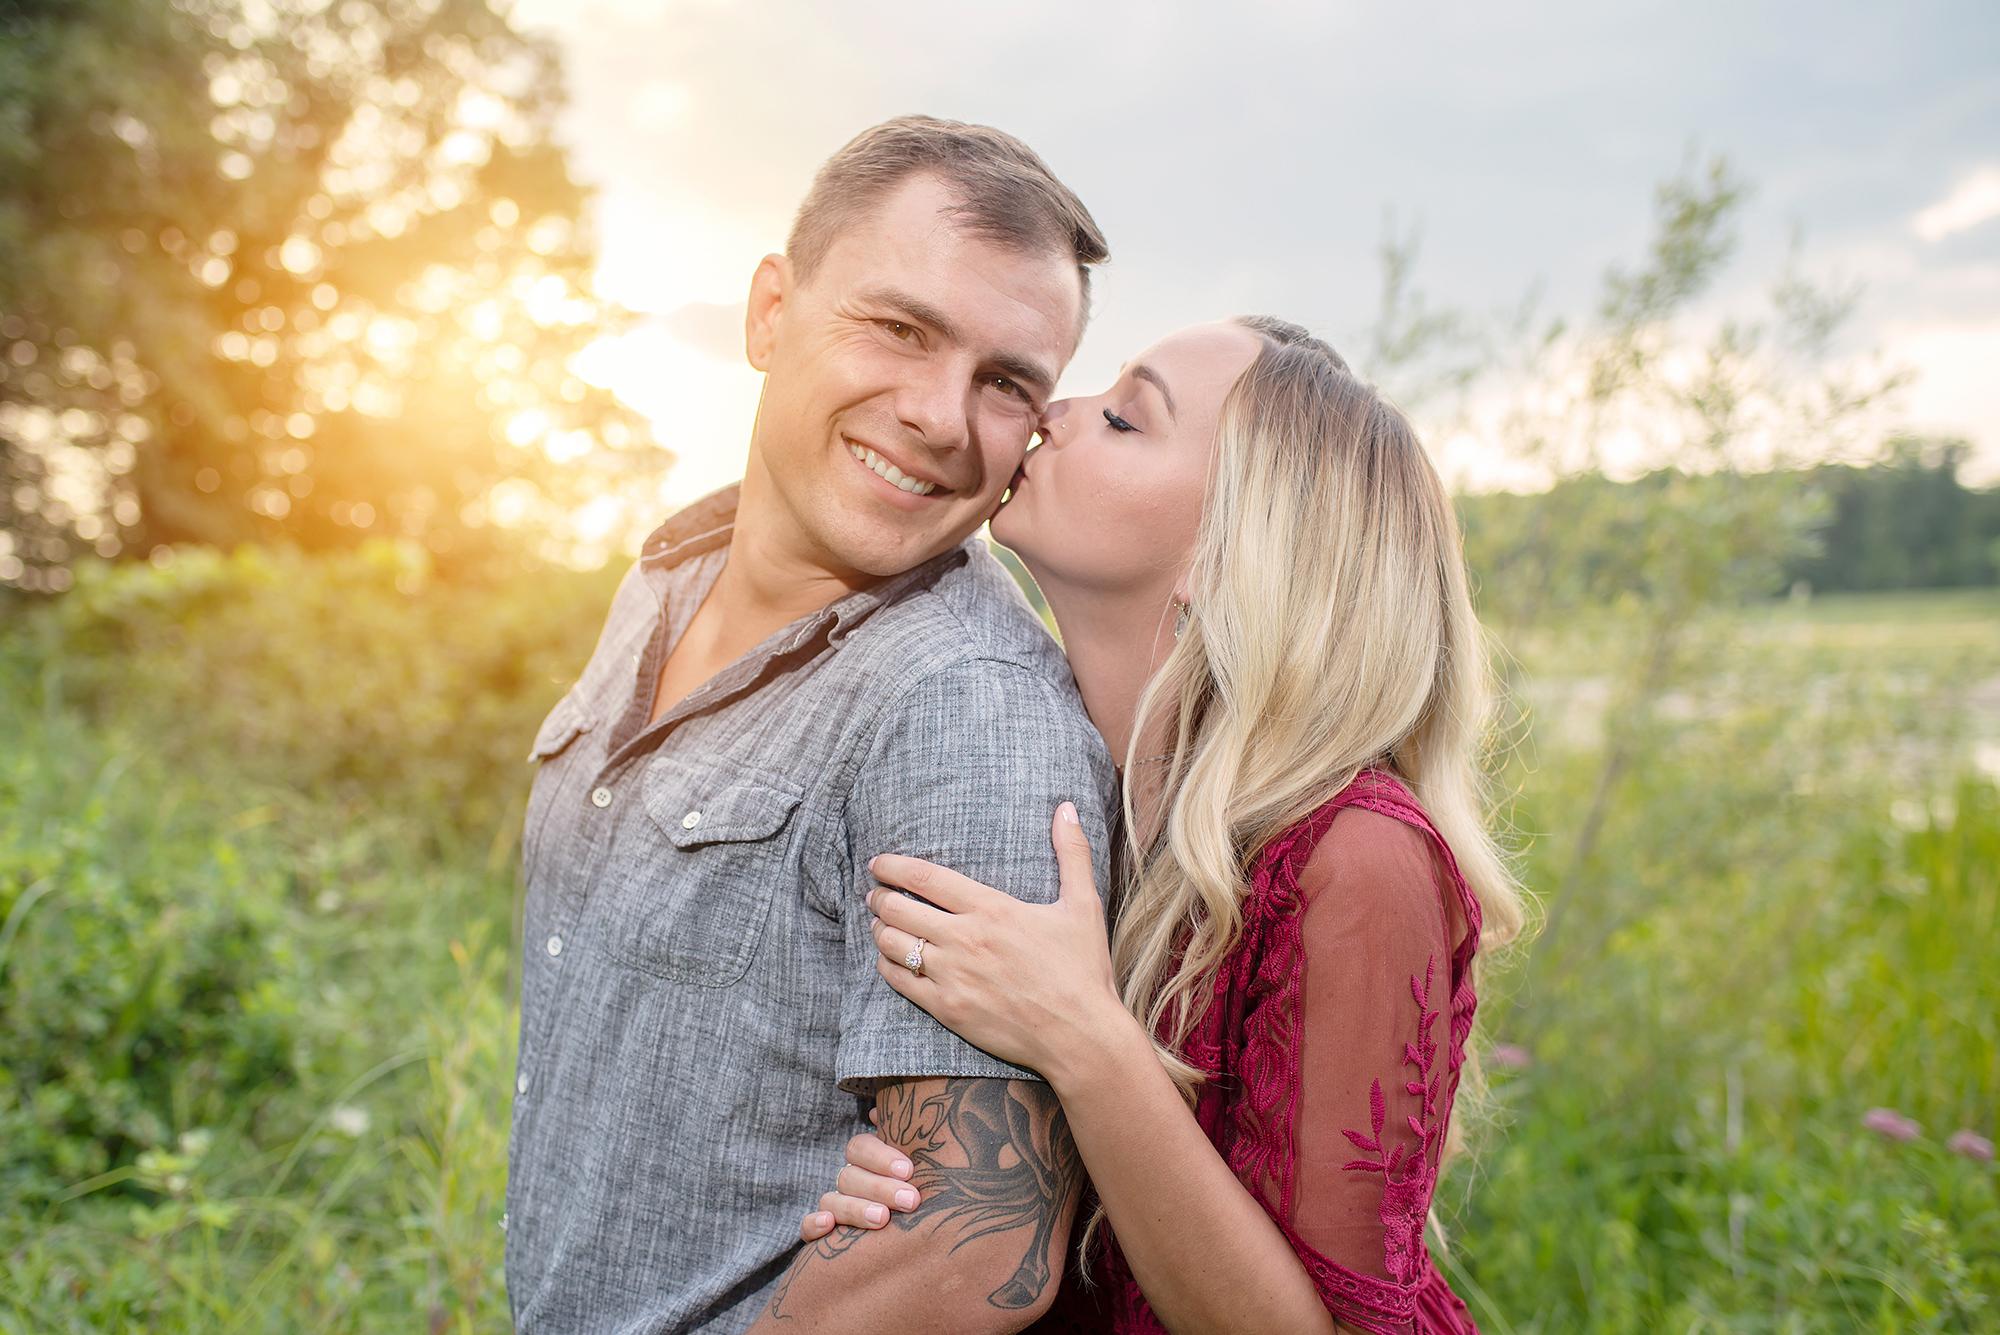 Lindsay-Adkins-Photography-Michigan-Wedding-Photographer-Page-David-Kensington-Metro-Park-Milford-Michigan-Blog-10